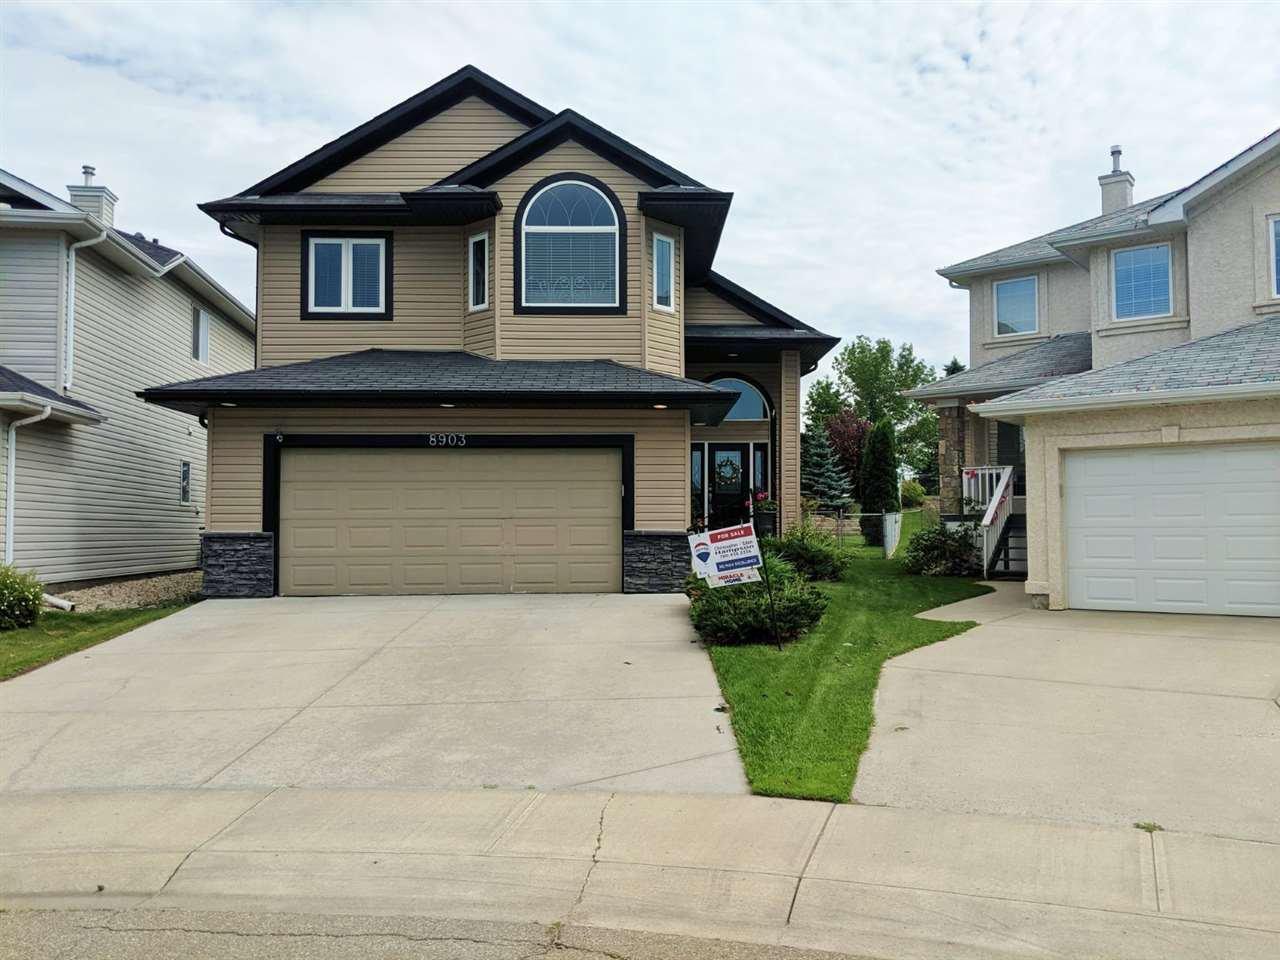 Main Photo: 8903 210 Street in Edmonton: Zone 58 House for sale : MLS®# E4169013